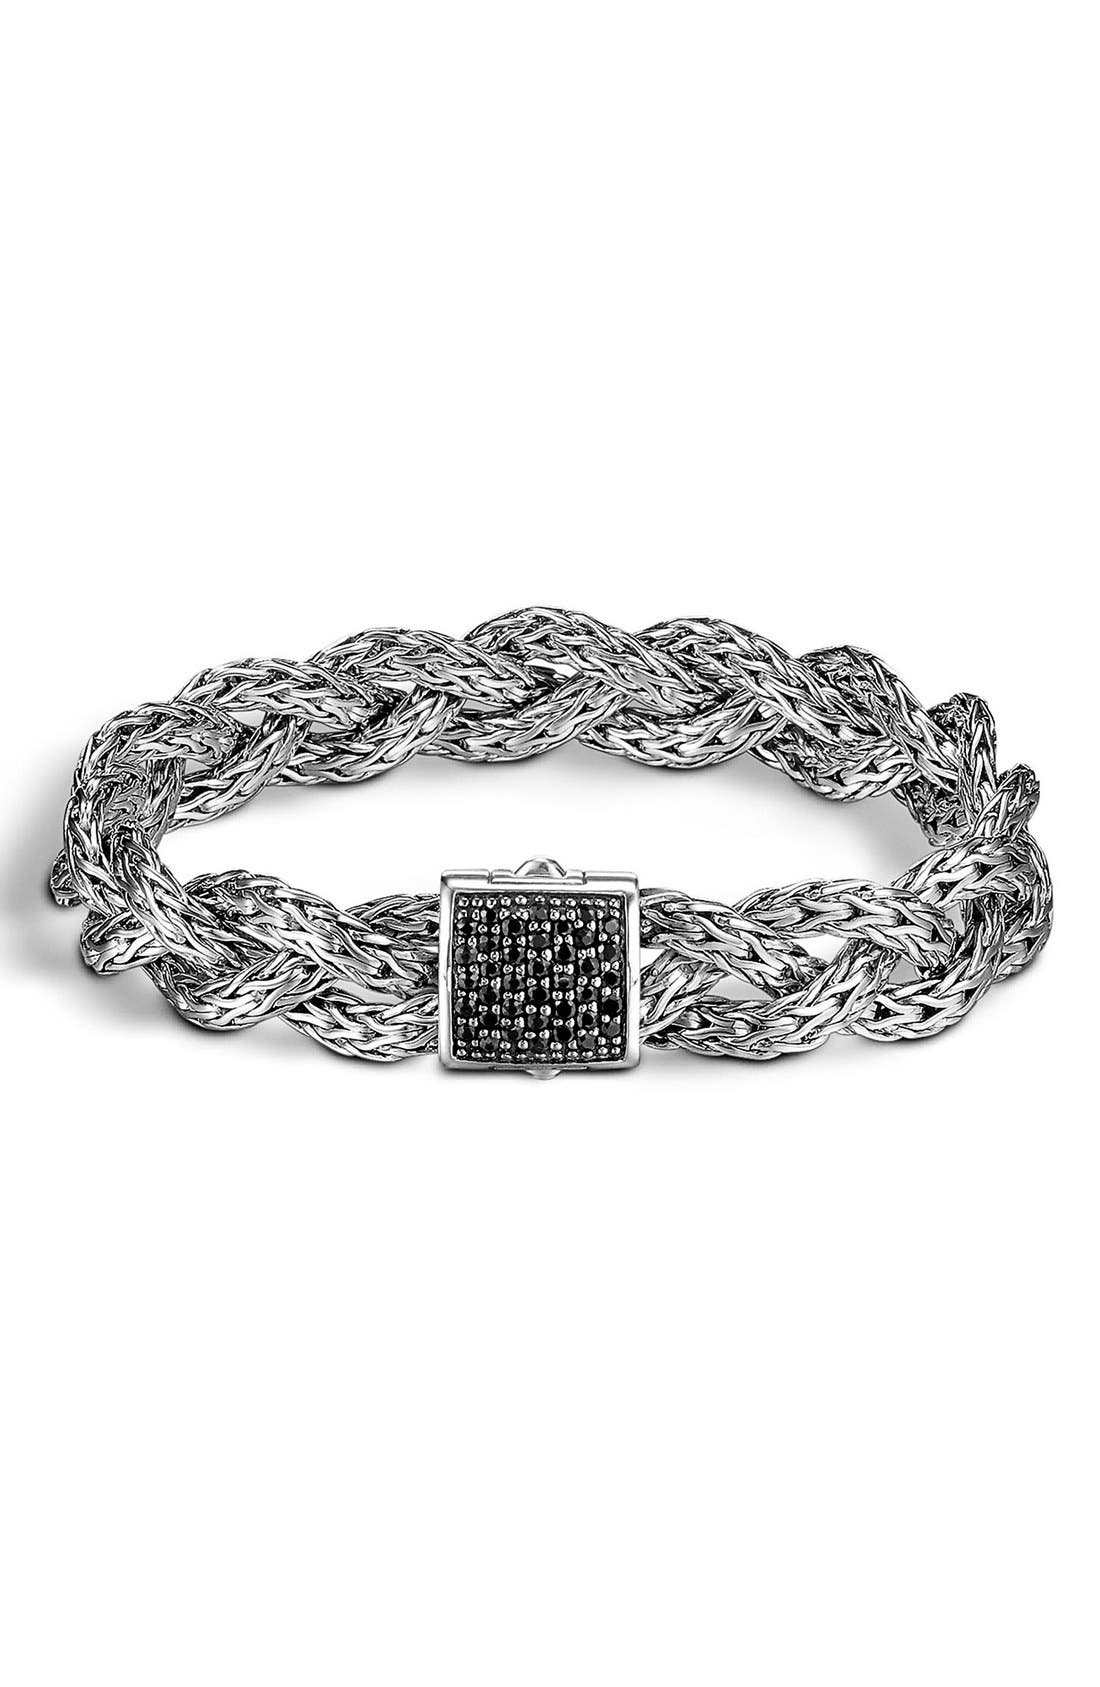 'Braided Chain' Semiprecious Stone Bracelet,                             Main thumbnail 1, color,                             040